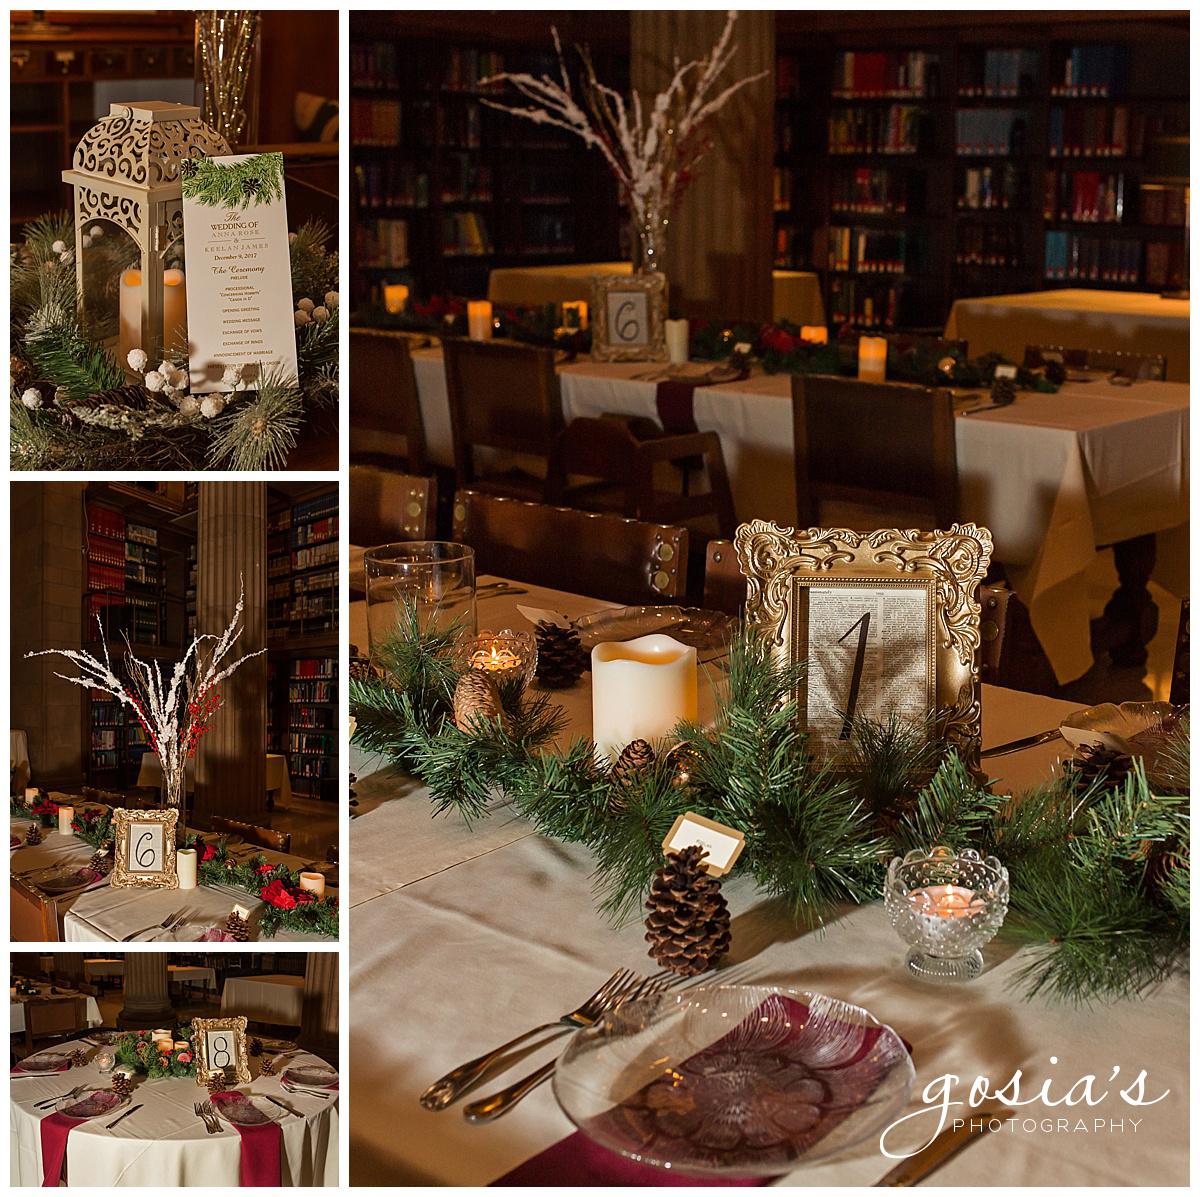 Gosias-Photography-Appleton-wedding-photographer-Saint-Paul-James-J-Hill-Center-ceremony-reception-Minnesota-_0053.jpg